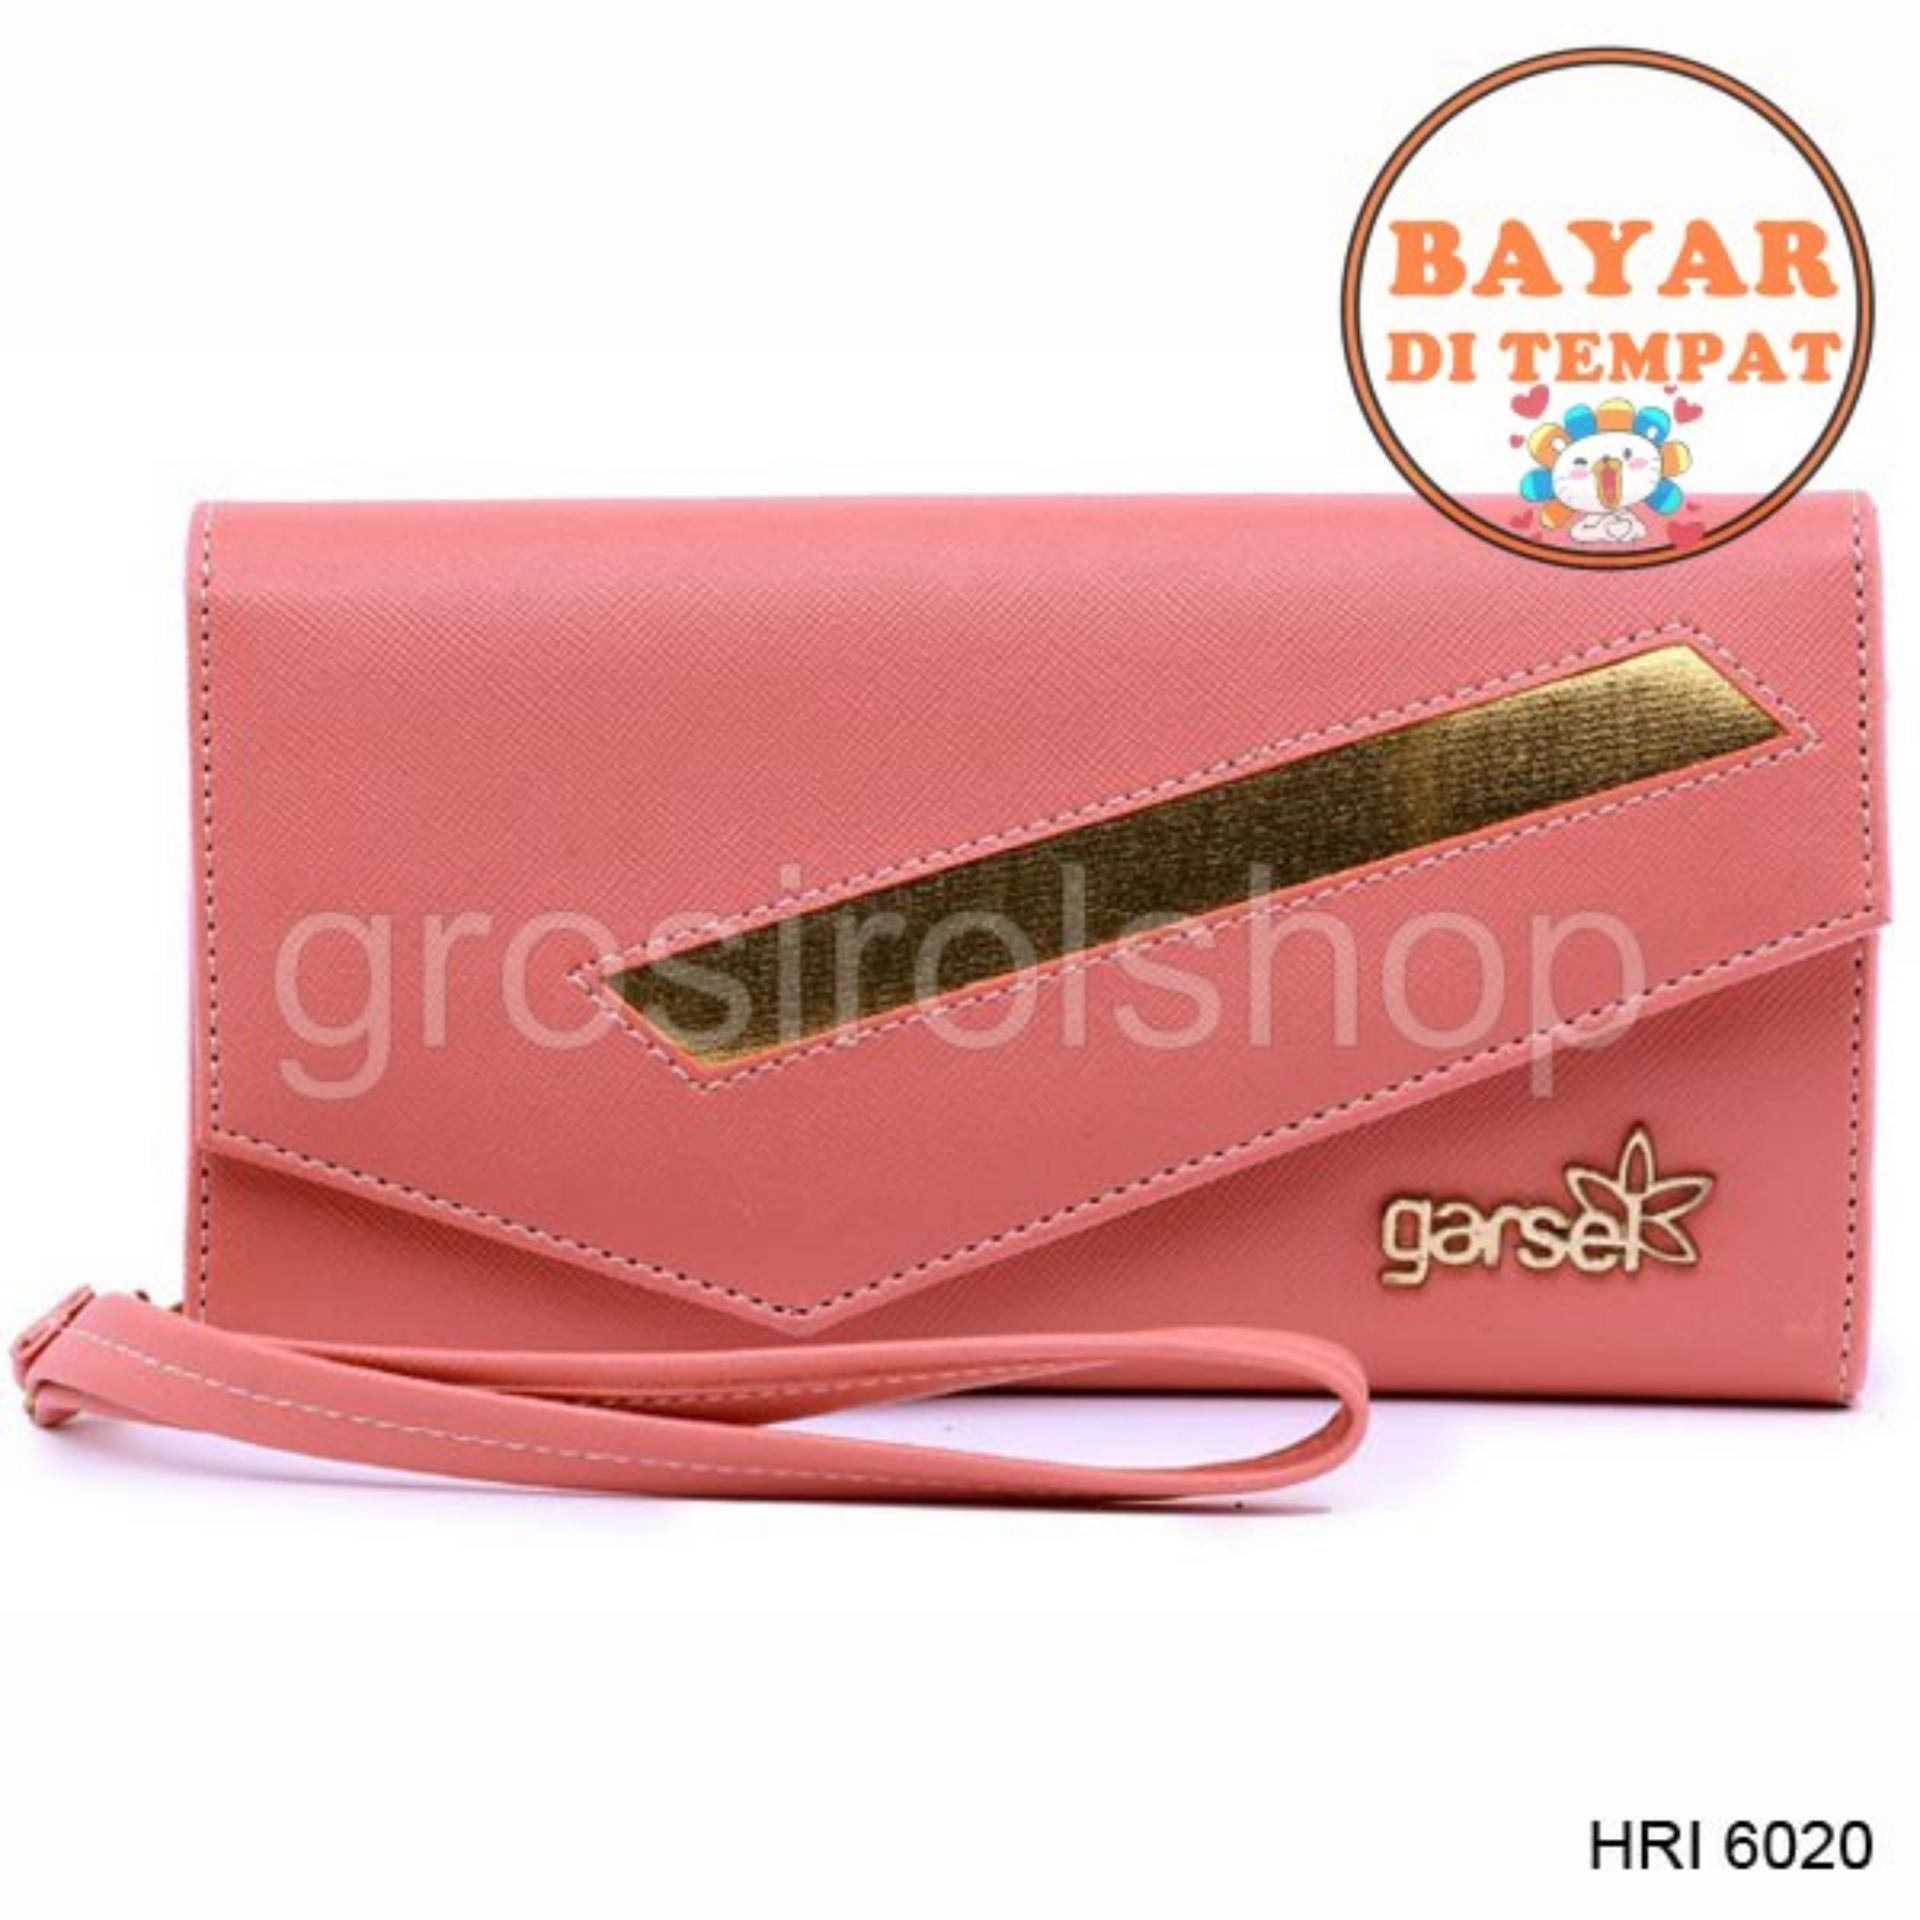 Garsel Dompet Pria Silky 384 Gln 026 Cokelat Update Daftar Harga Kastel 385 Dnd 8226 Hitam Wanita Fti 019 Source Fashion Premium Lucu Dan Modis Original